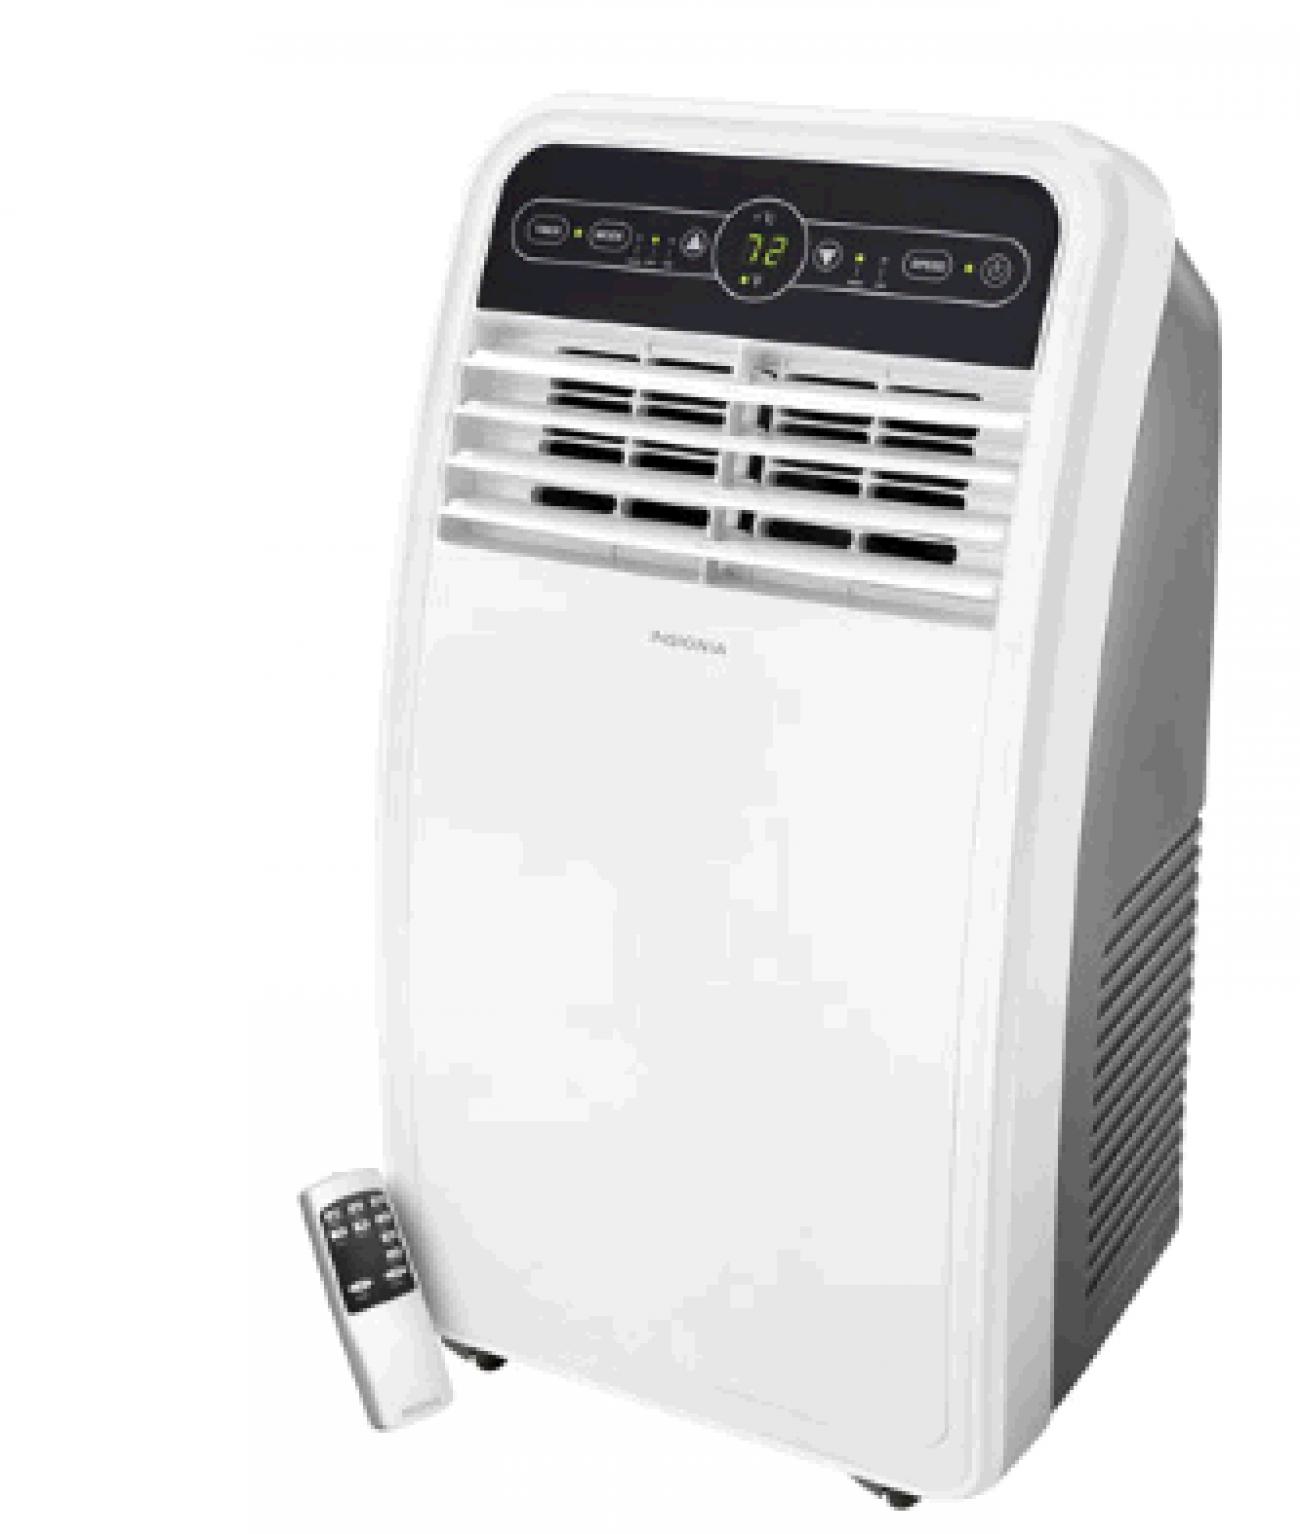 insignia portable air conditioner 8000 btu start saving today. Black Bedroom Furniture Sets. Home Design Ideas